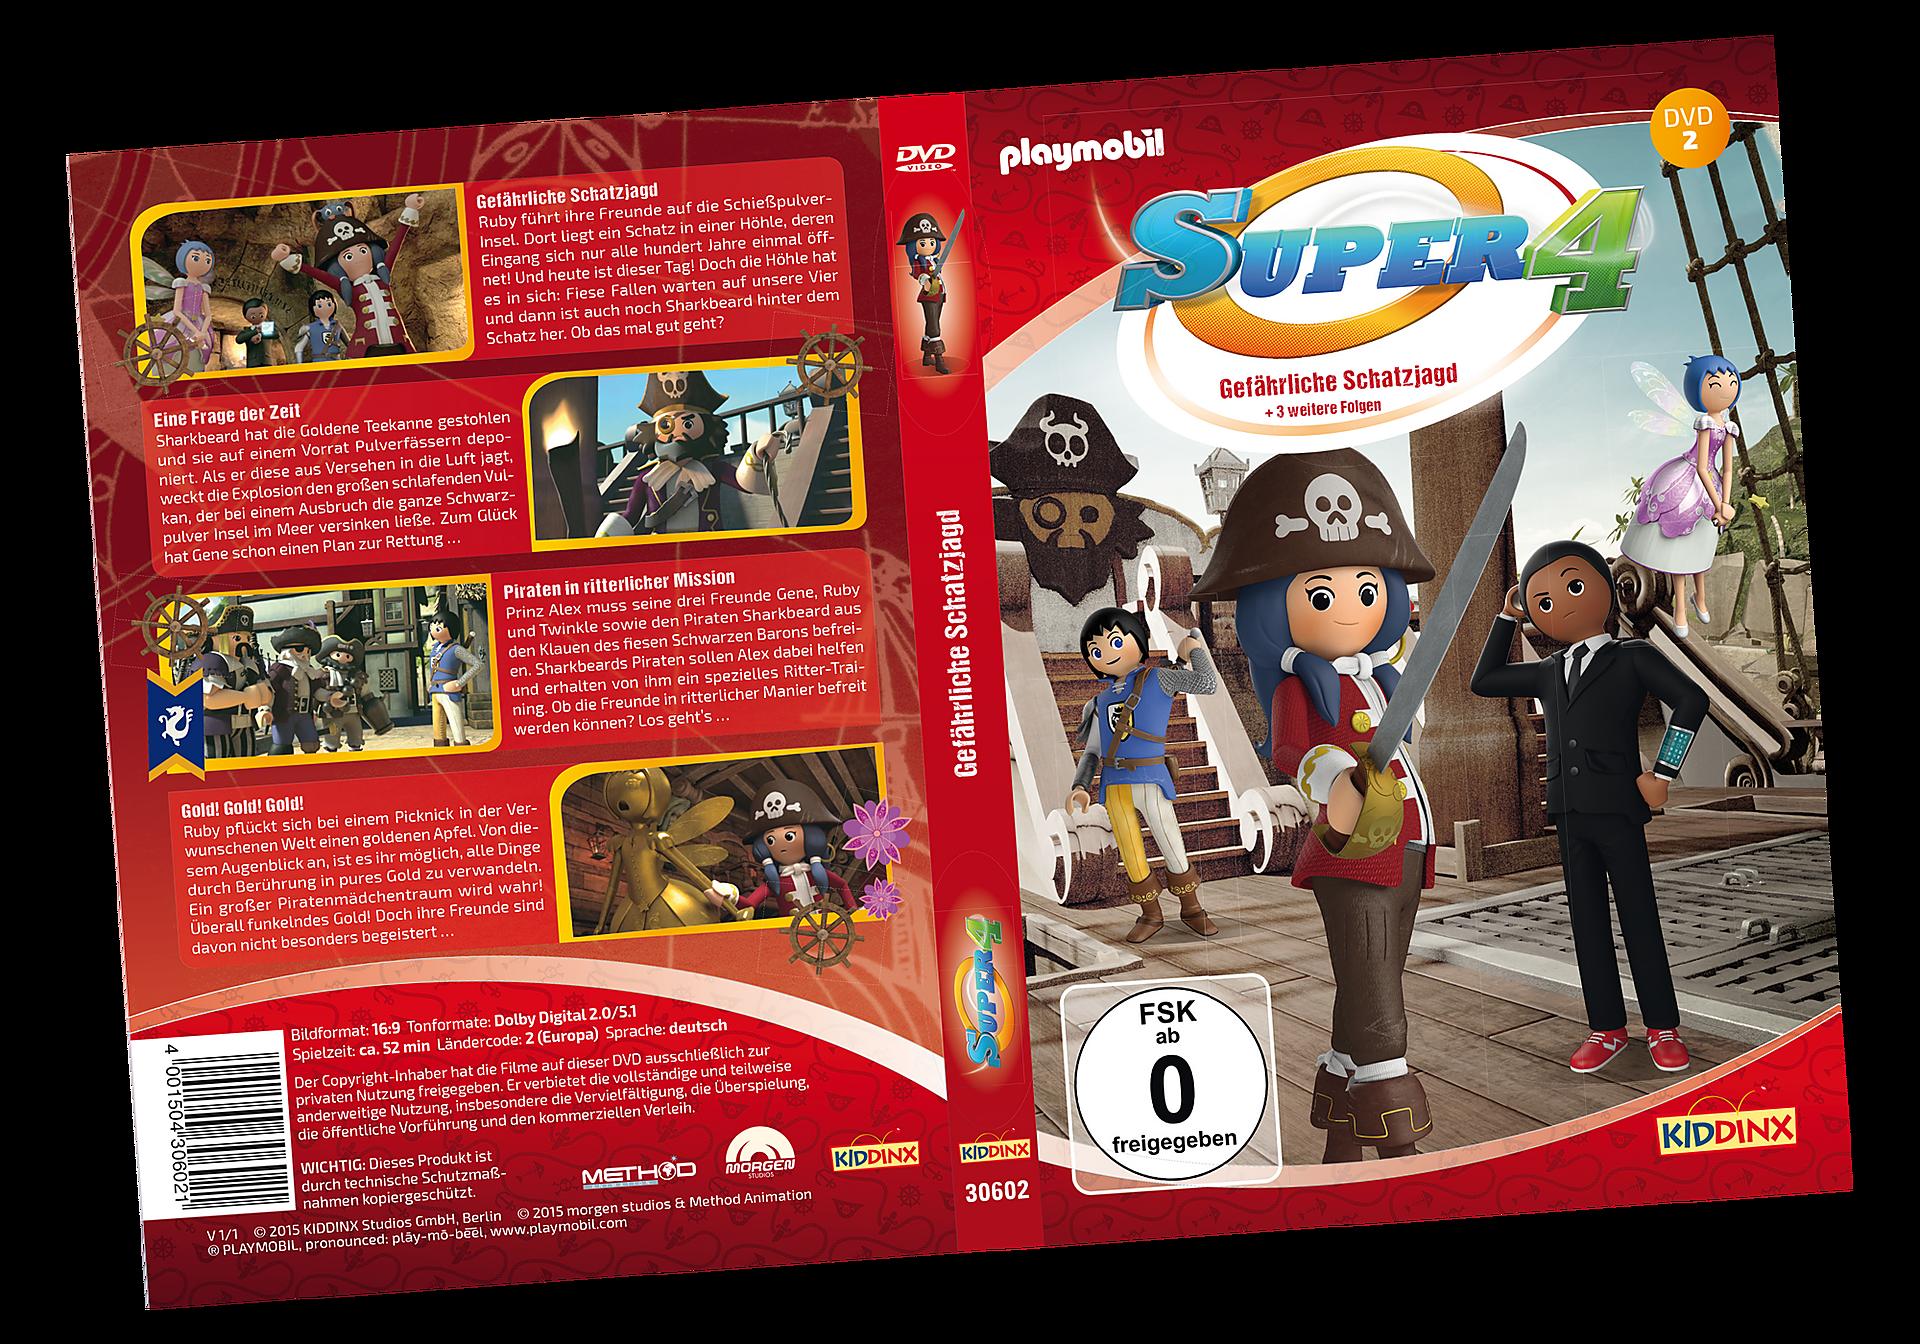 http://media.playmobil.com/i/playmobil/80477_product_detail/DVD 2 Super4: Gefährliche Schatzjagd